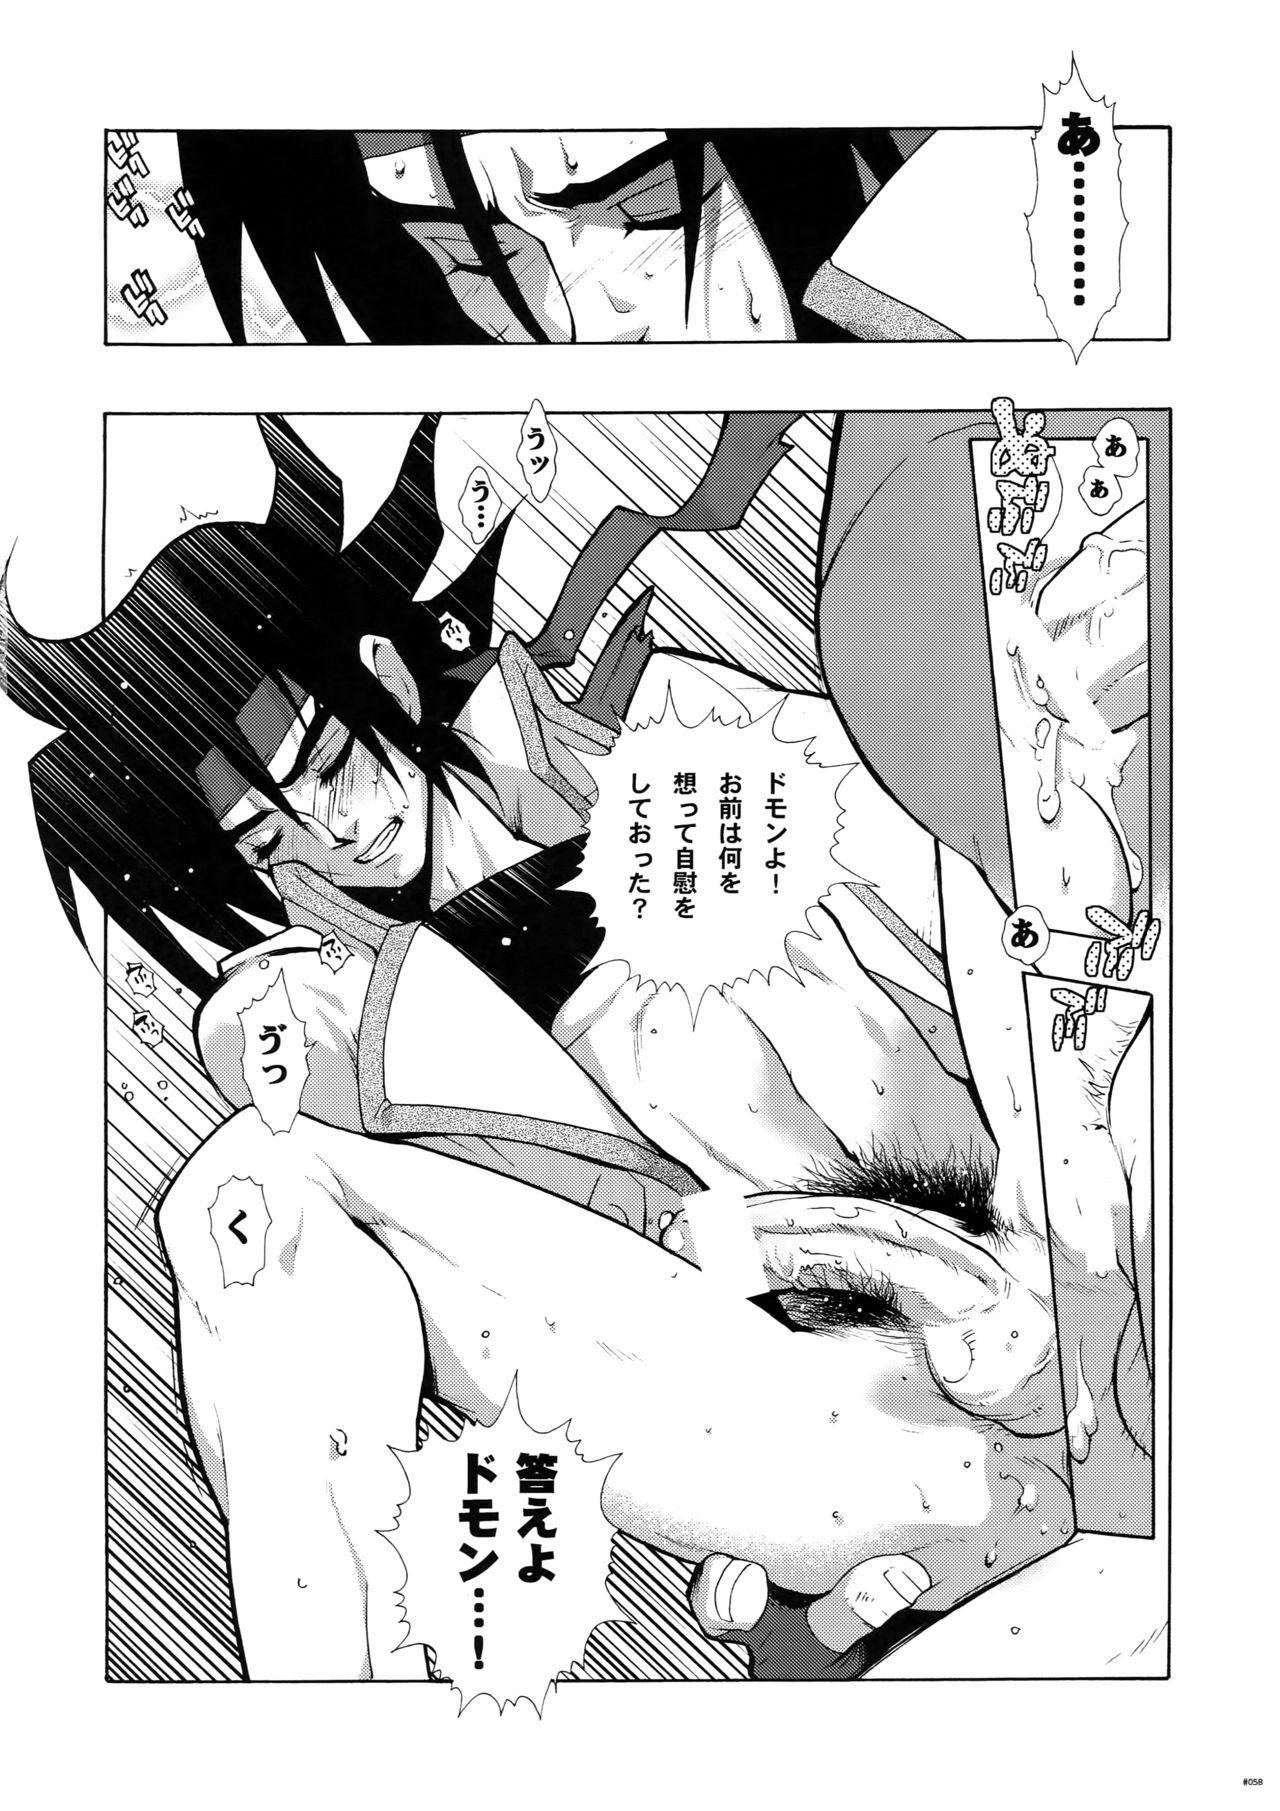 [Article 60 of Criminal Code (Shuhan)] G-gan Josei-Muke Sairoku-Shuu (G Gundam) 57